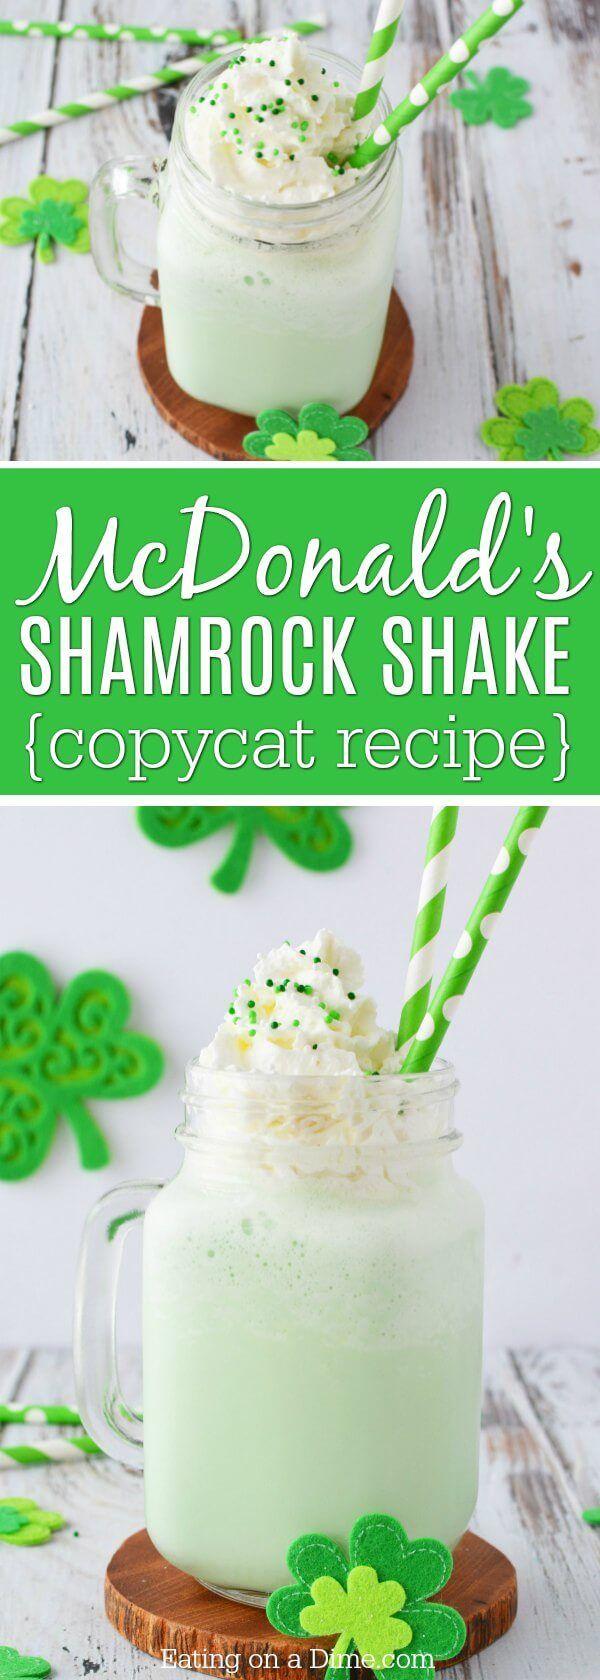 Copy Cat Mcdonald's Shamrock Shake